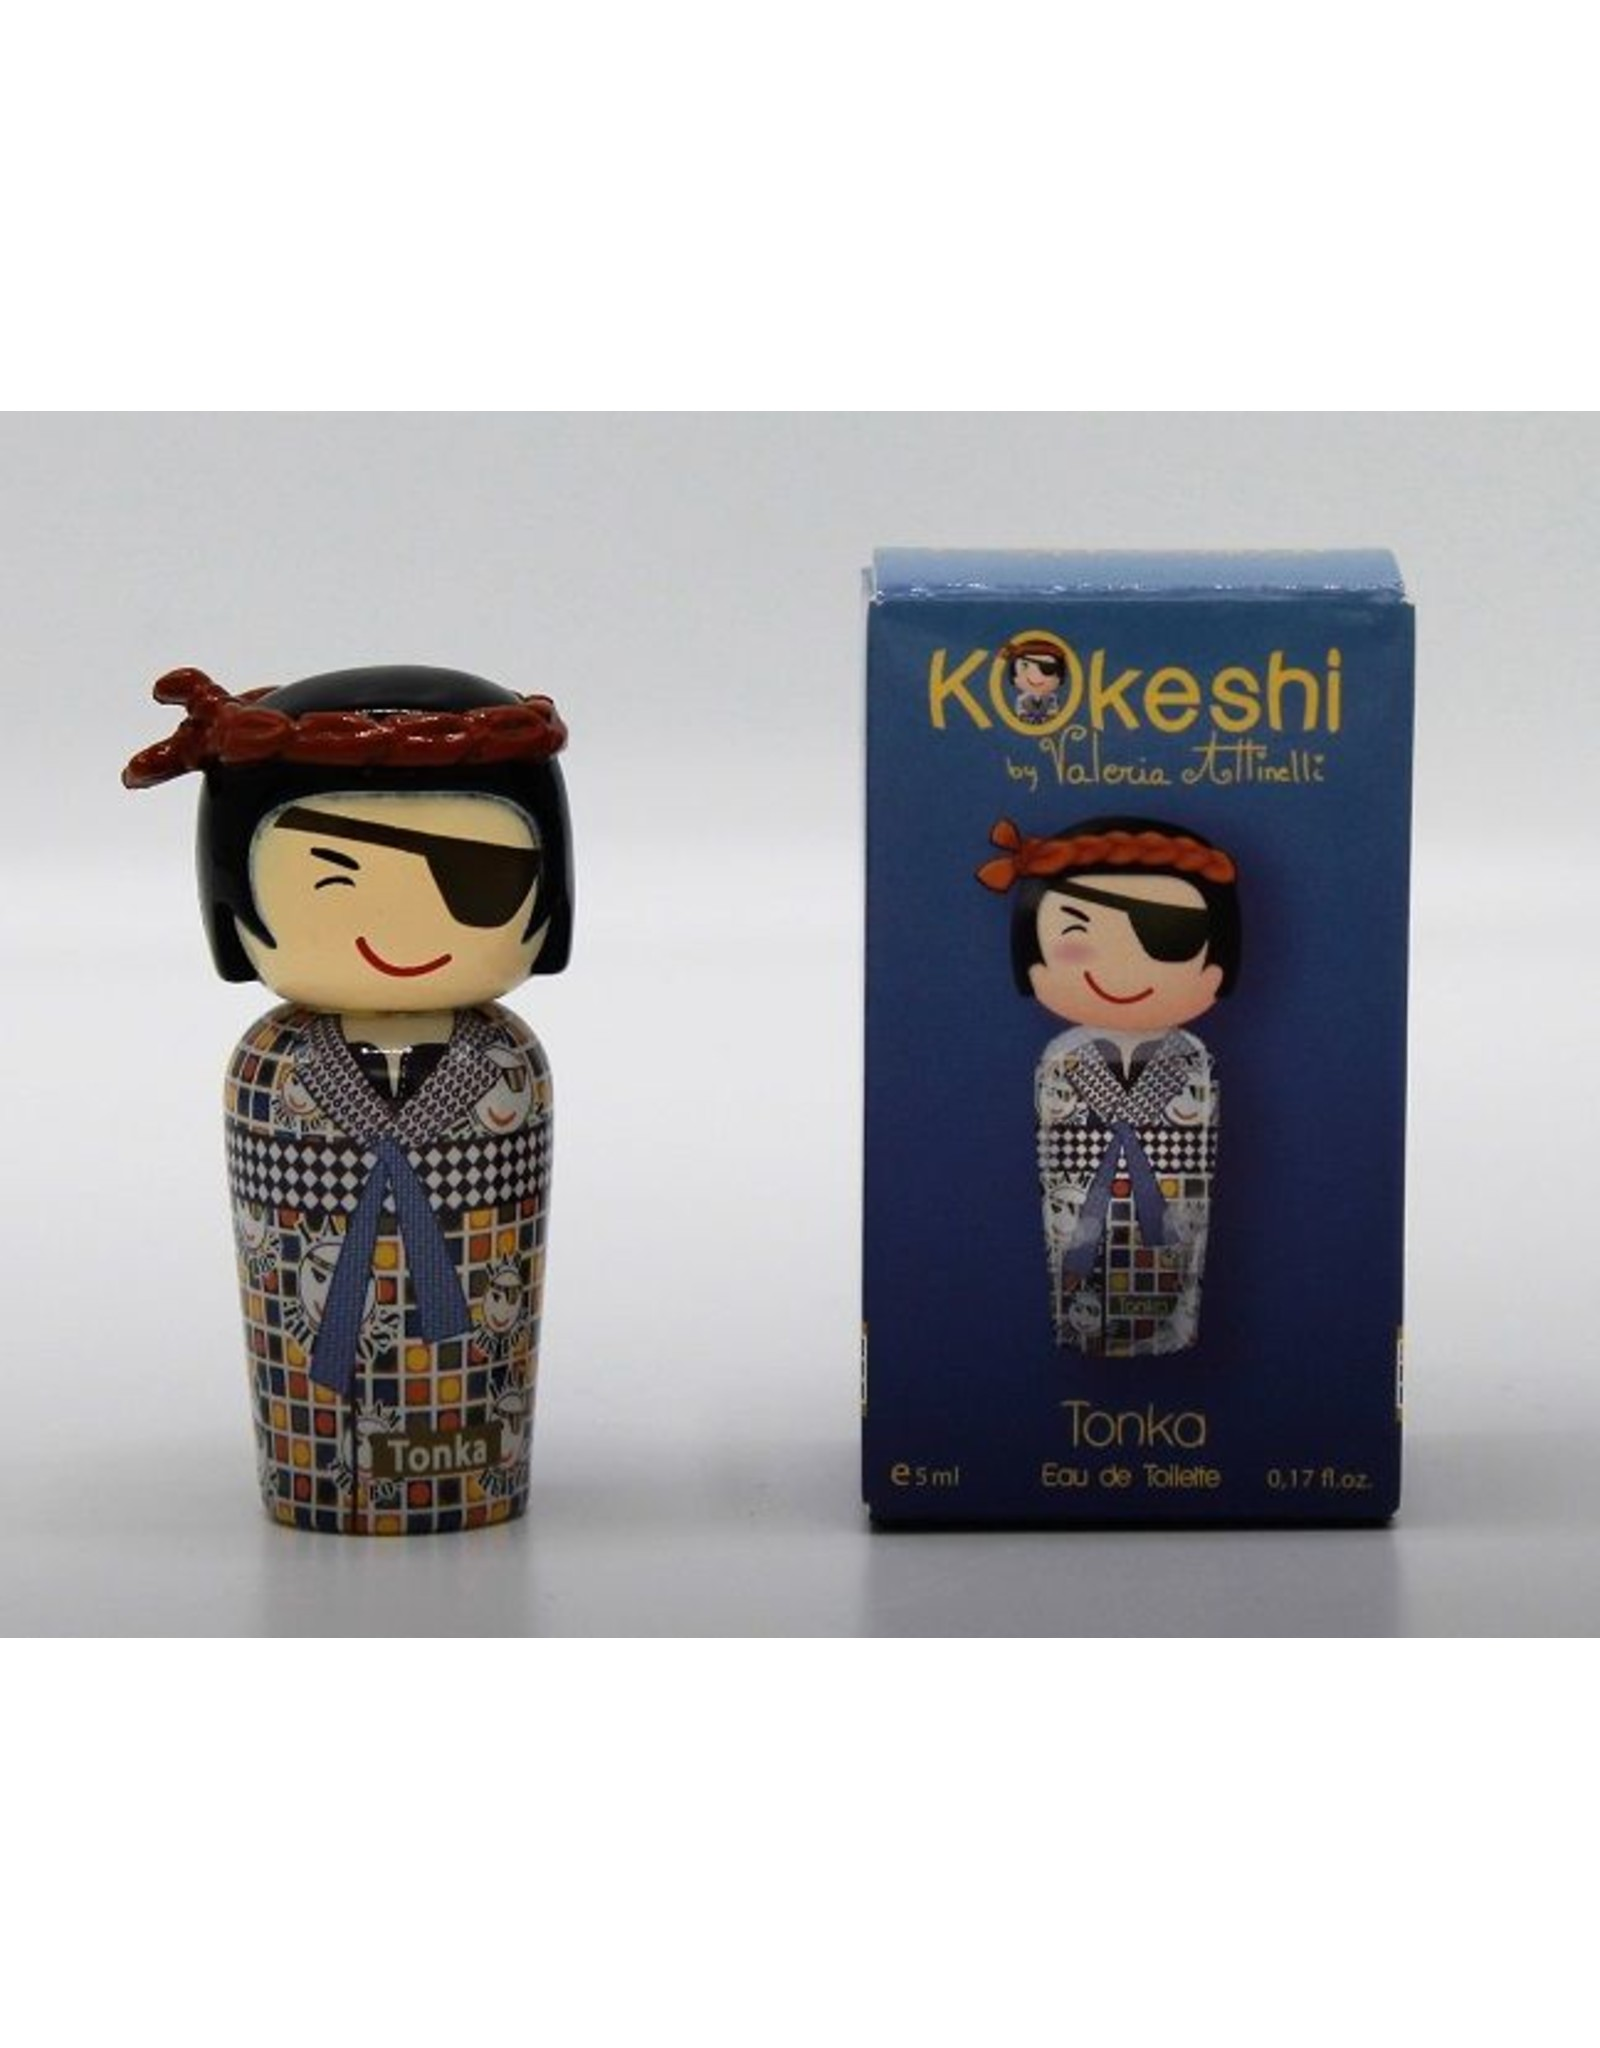 Kokeshi Tonka MINI - Kokeshi by Valeria Attinelli - Eau De Toilette 5 ml